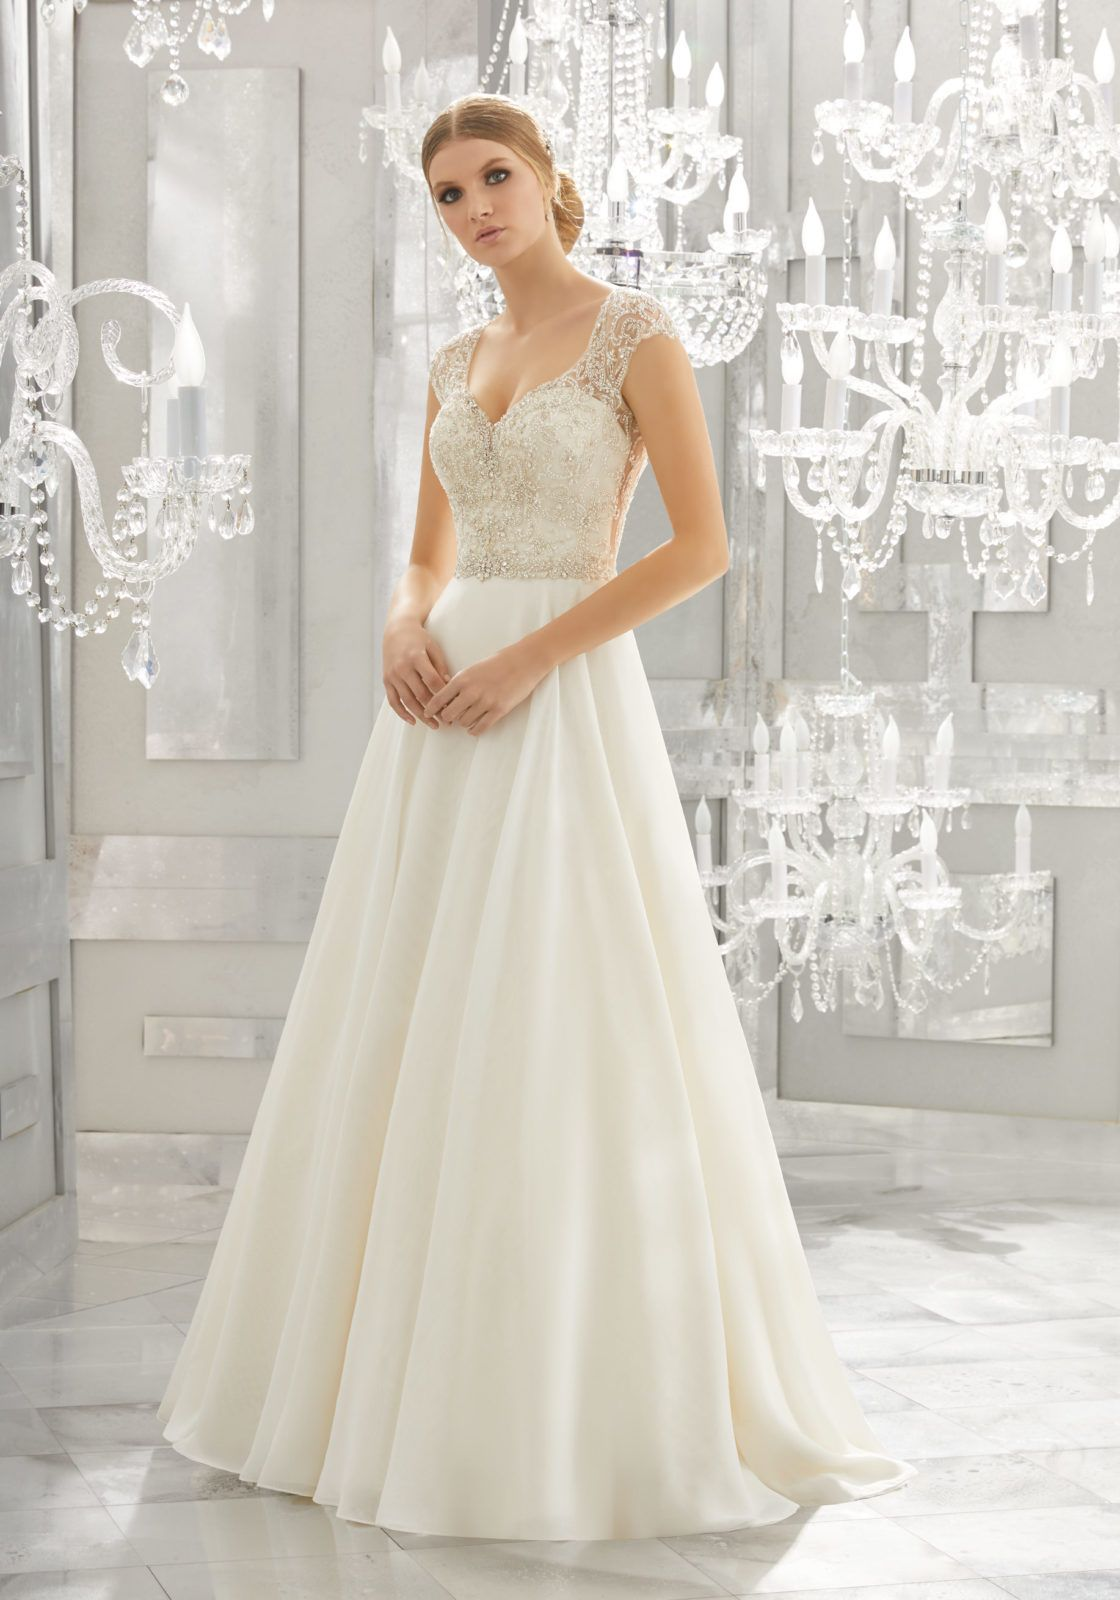 Mollie wedding dress in wedding dresses pinterest wedding